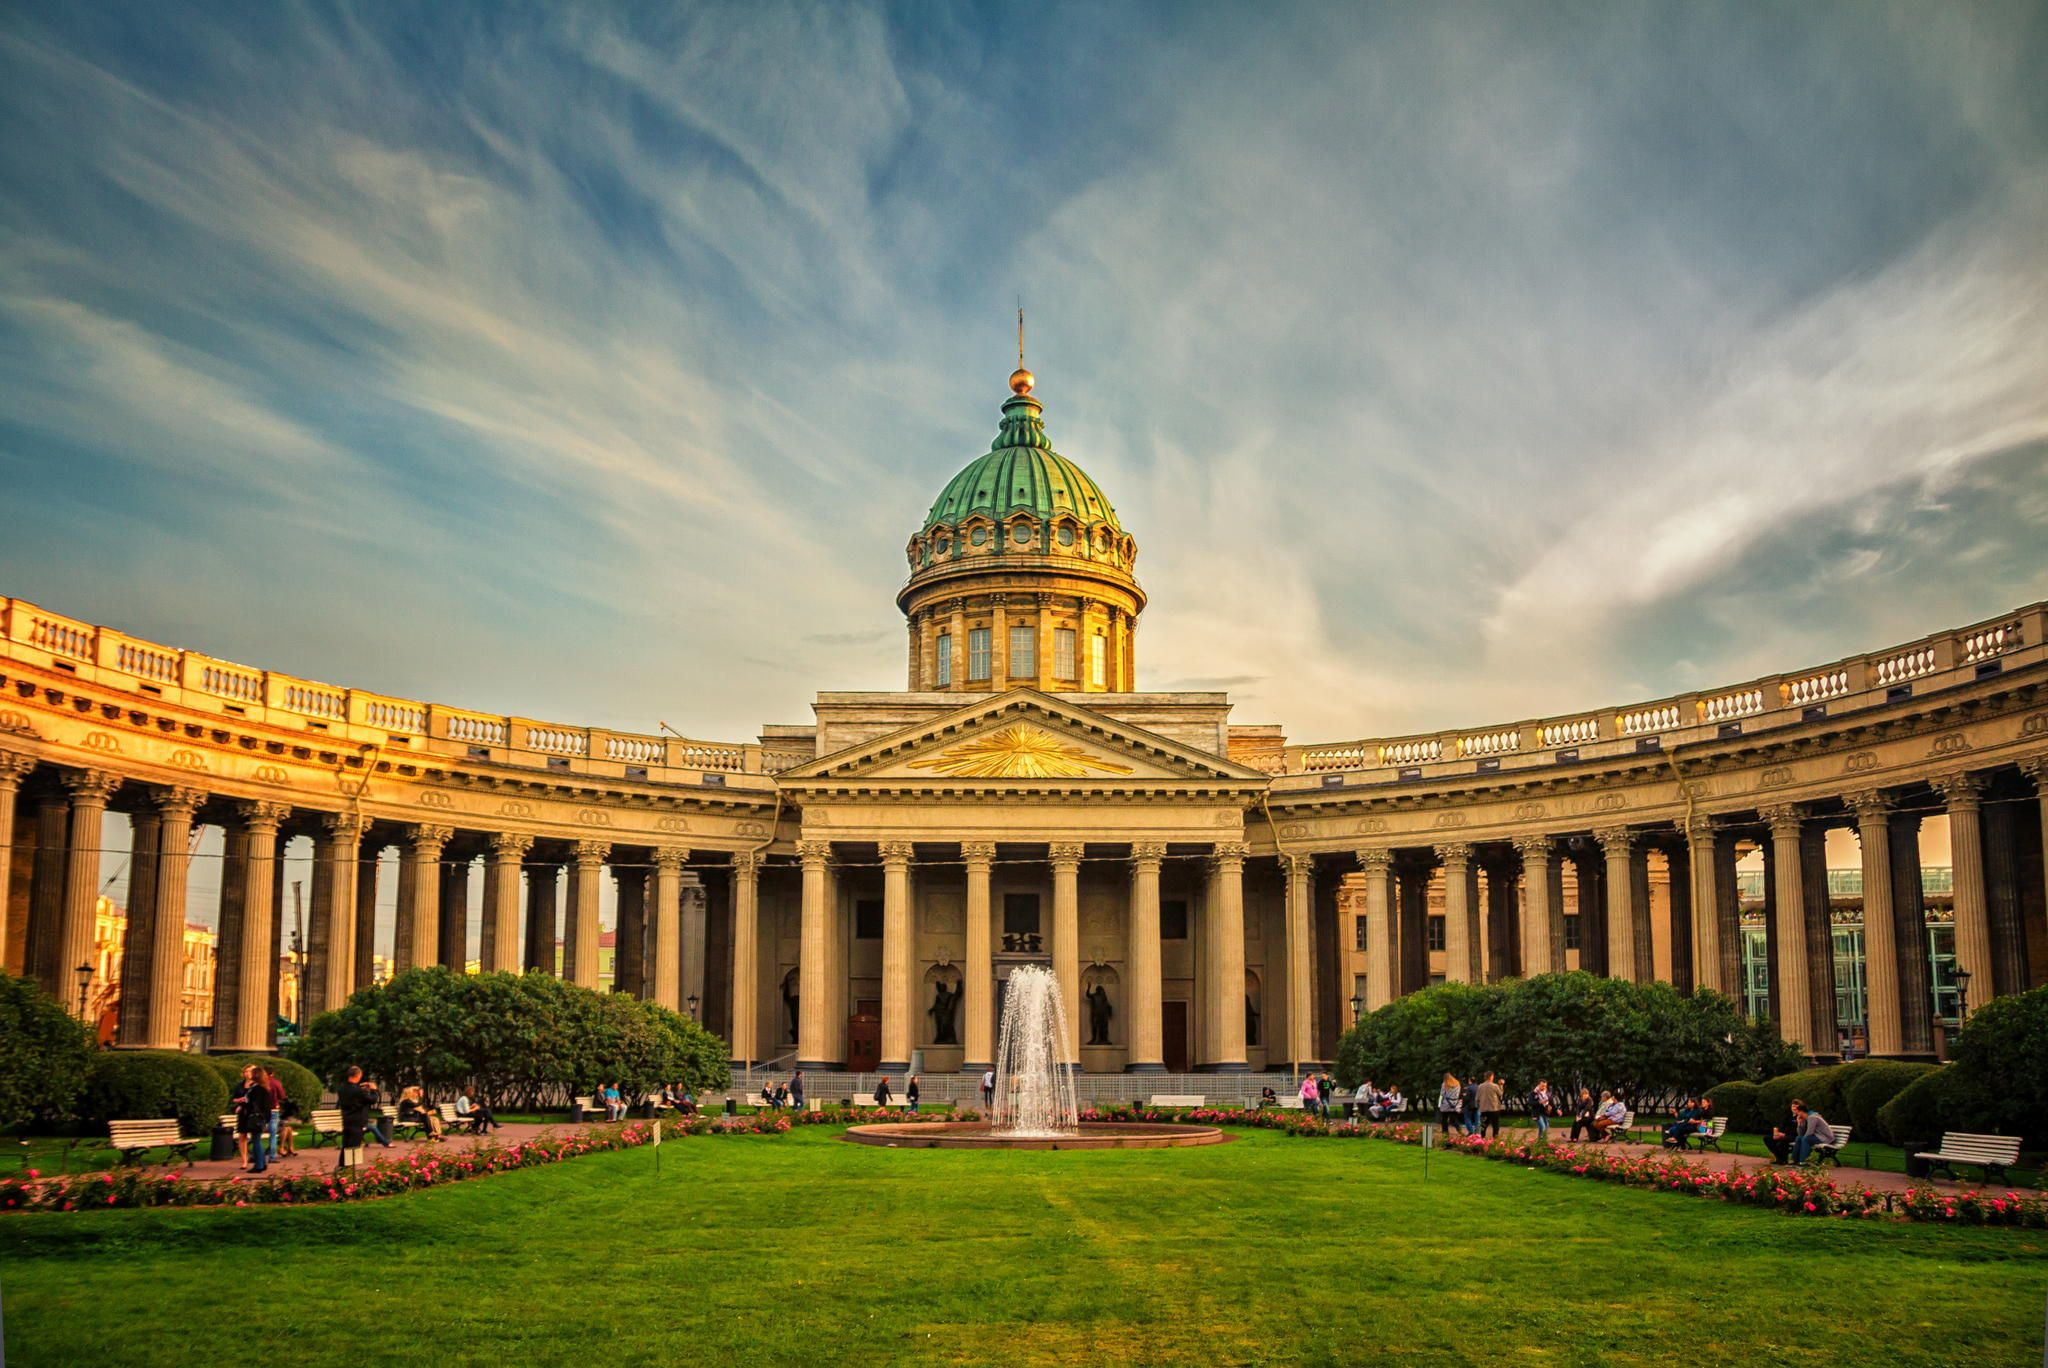 Cathedrals of Saint Petersburg